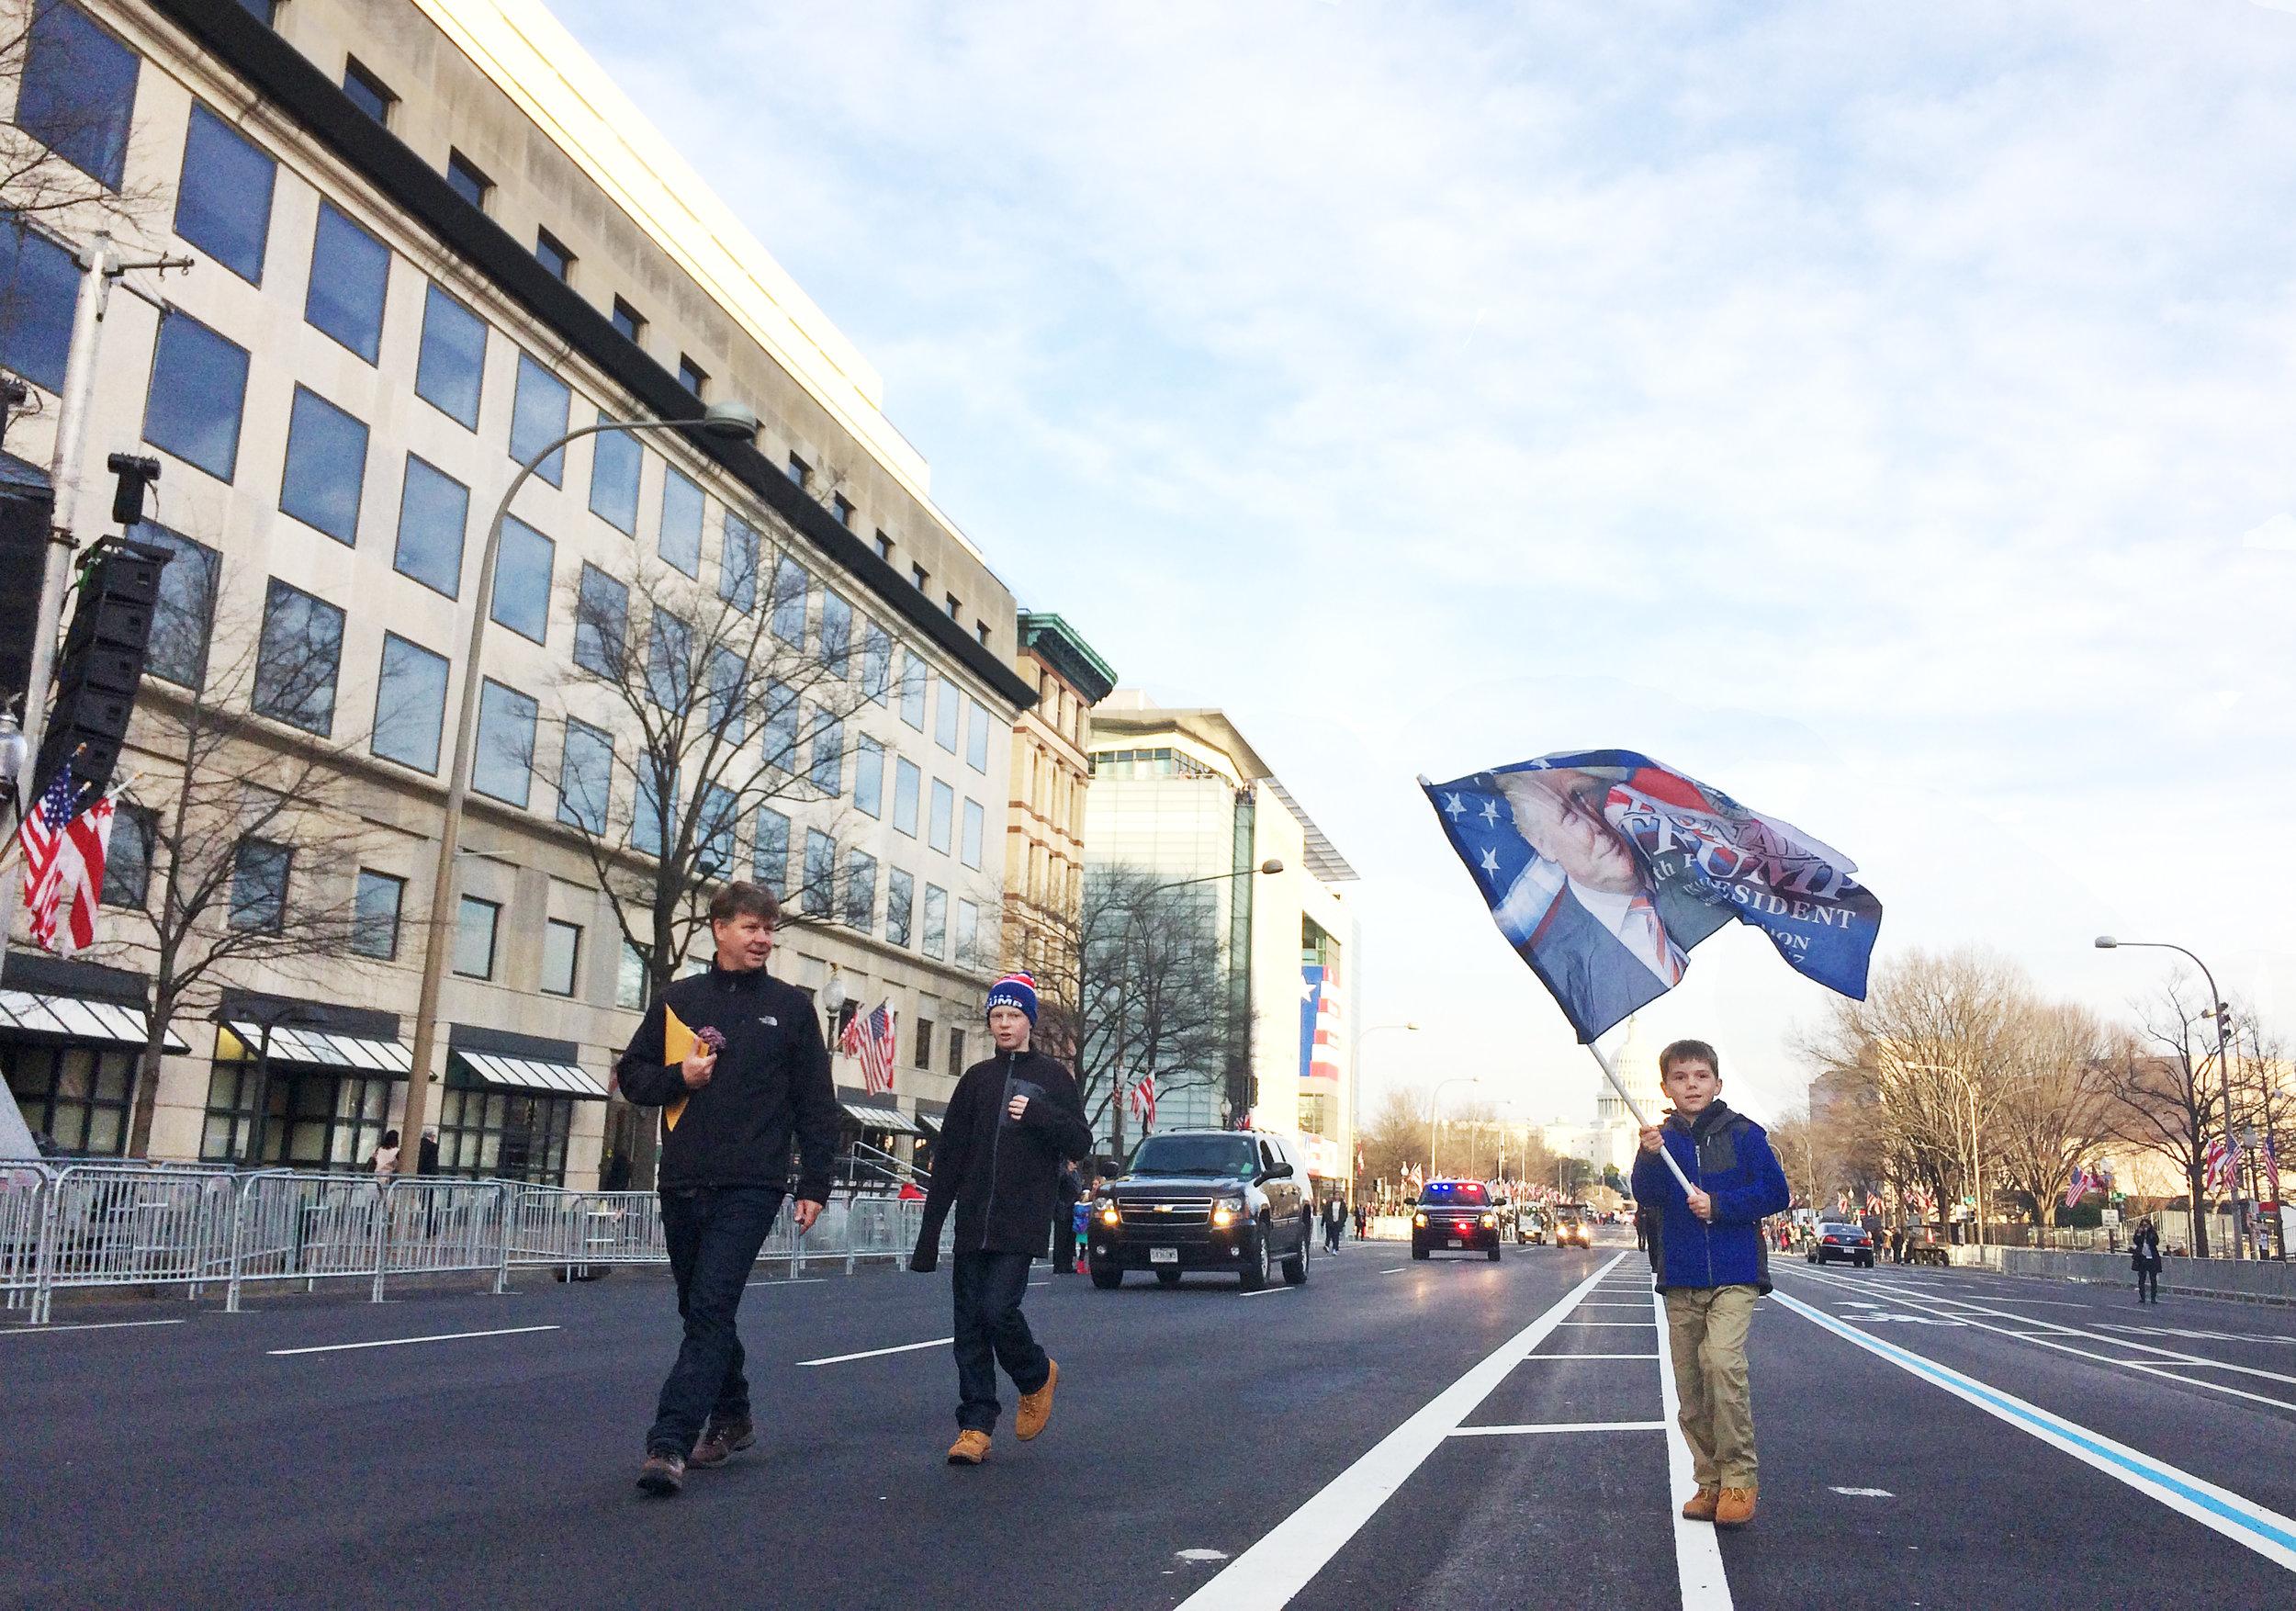 A boy walked down Pennsylvania Avenue in Washington D.C., waving a flag picturing Donald Trump, on Jan. 19, 2017.